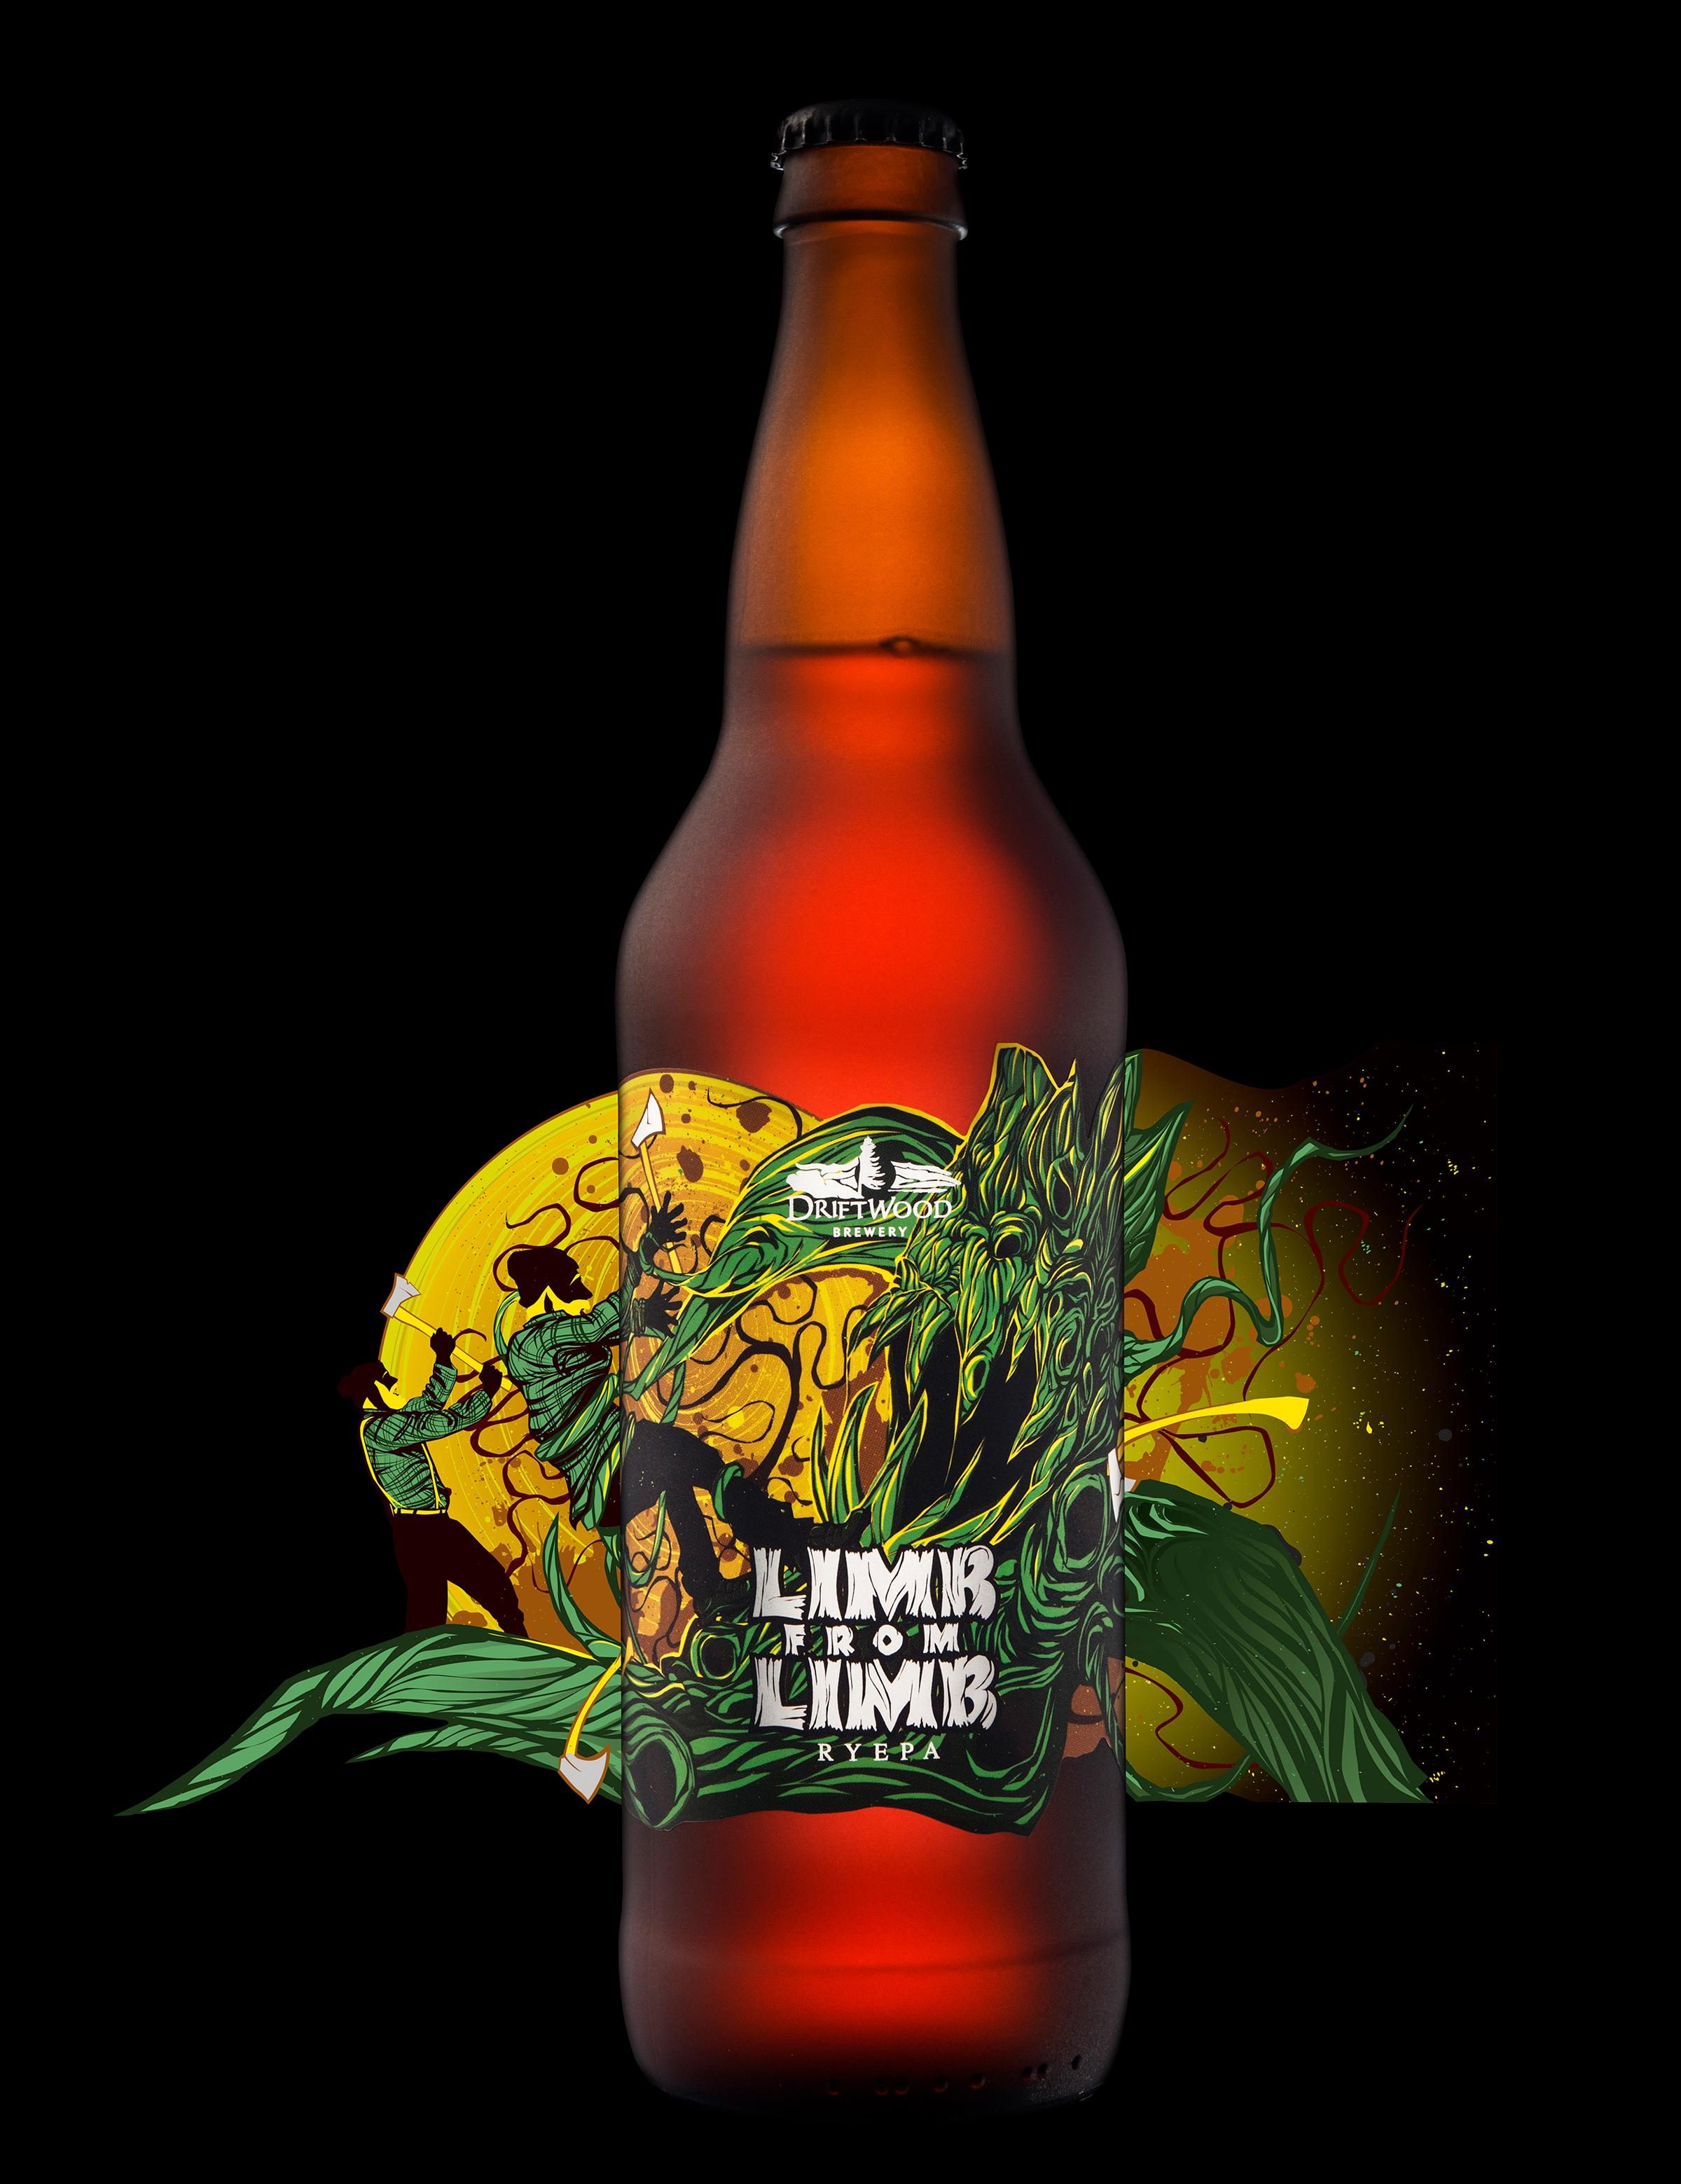 Limb From Limb RyePA